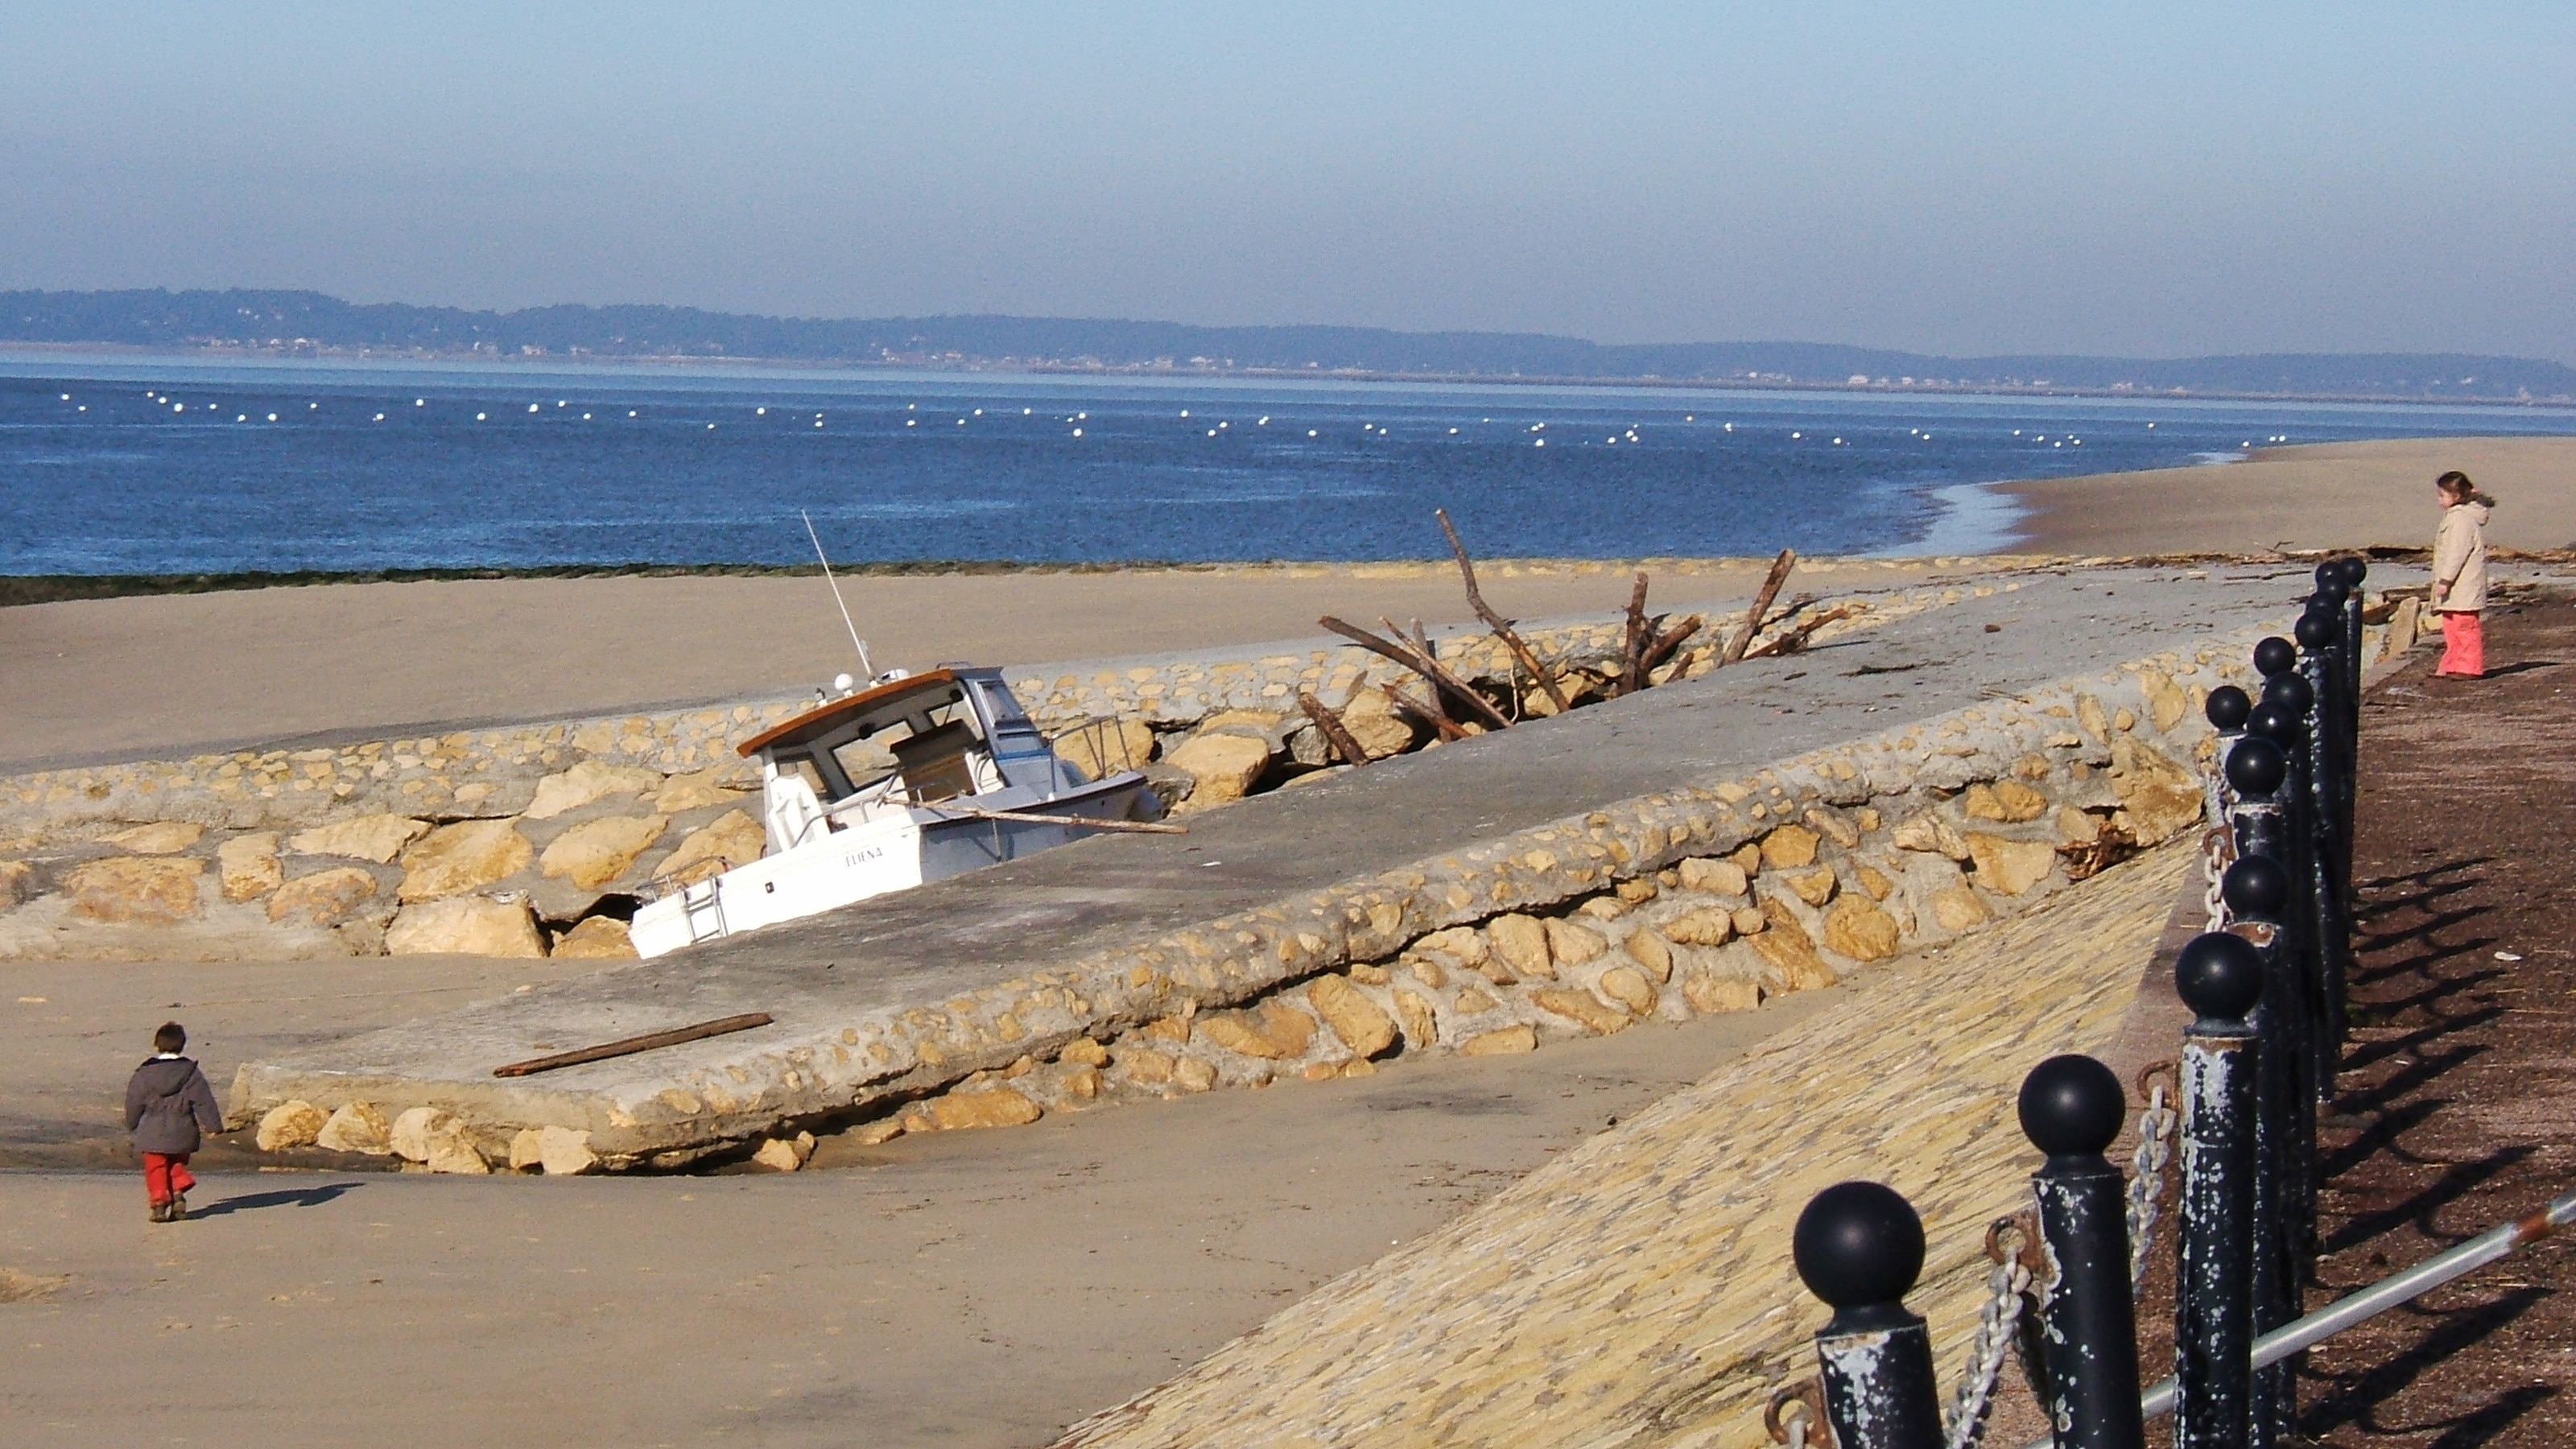 Le Moulleau, Gironde, France